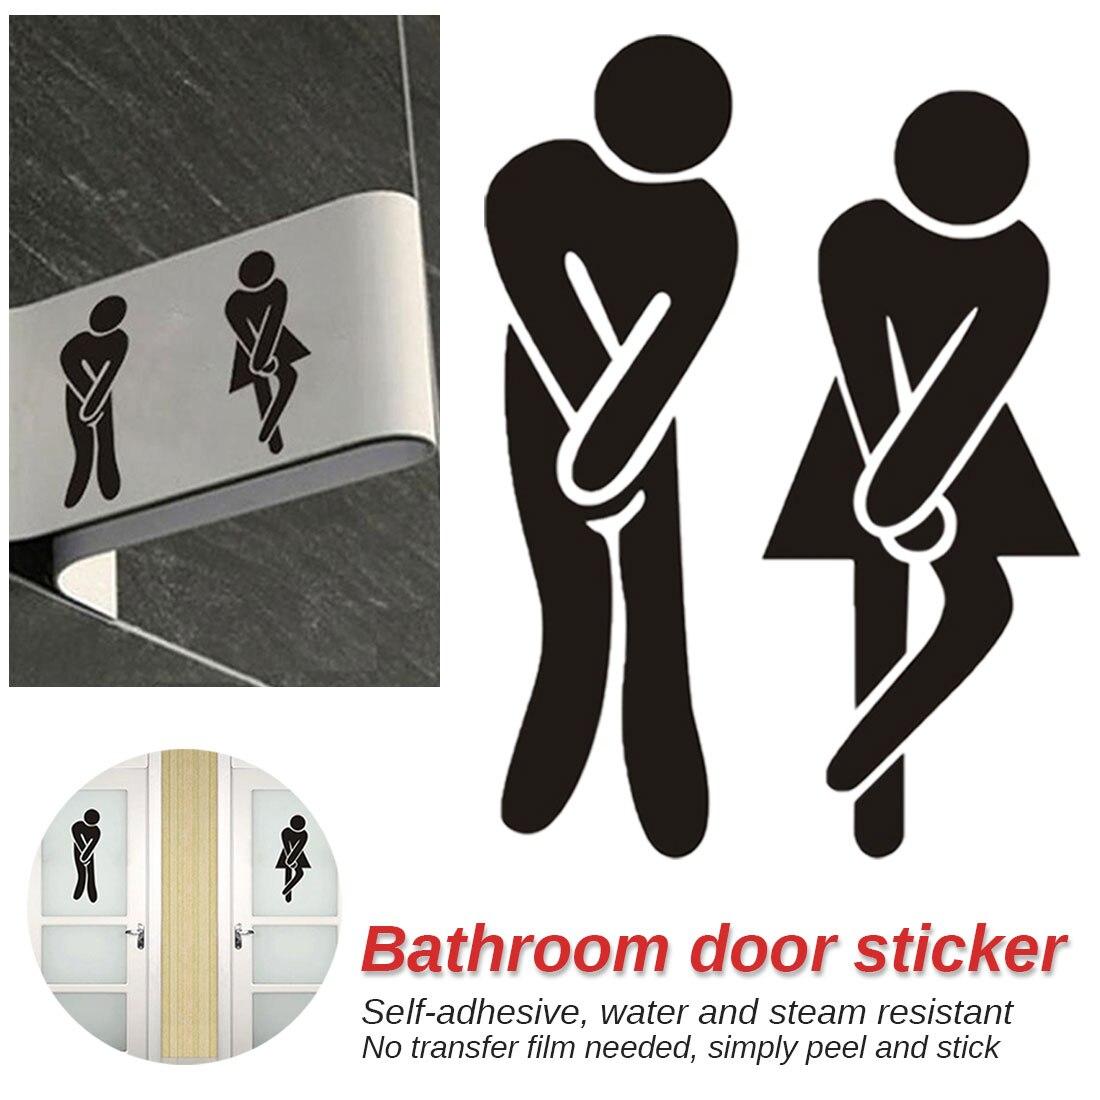 High Quality Wall Stickers Removable Cute Man Woman Washroom Door Toilet WC Sticker Family DIY Decor Bathroom door sticker